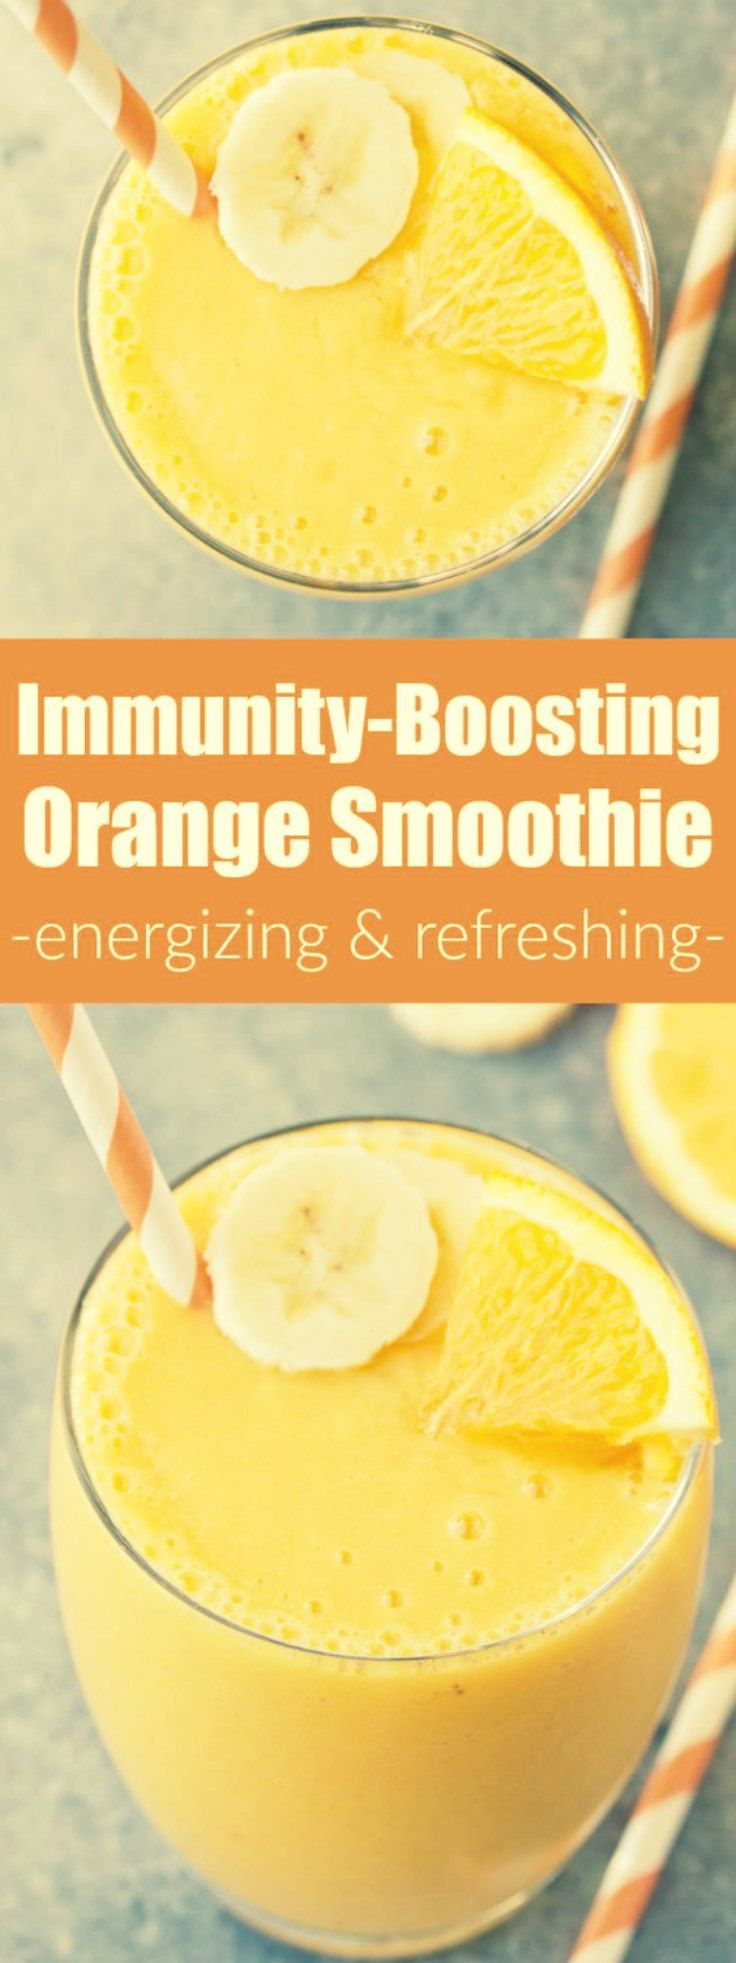 - Immunity Boosting Orange Smoothie  -   This Immunity Boosting Orange Smoothie packs a hefty dose of Vitamin C! It has a refreshing orange flavor with a hint of vanilla!  #smoothie #batido #orange #naranja #banana #platano #mango #vegan #vegano  via: @kristinekitchen